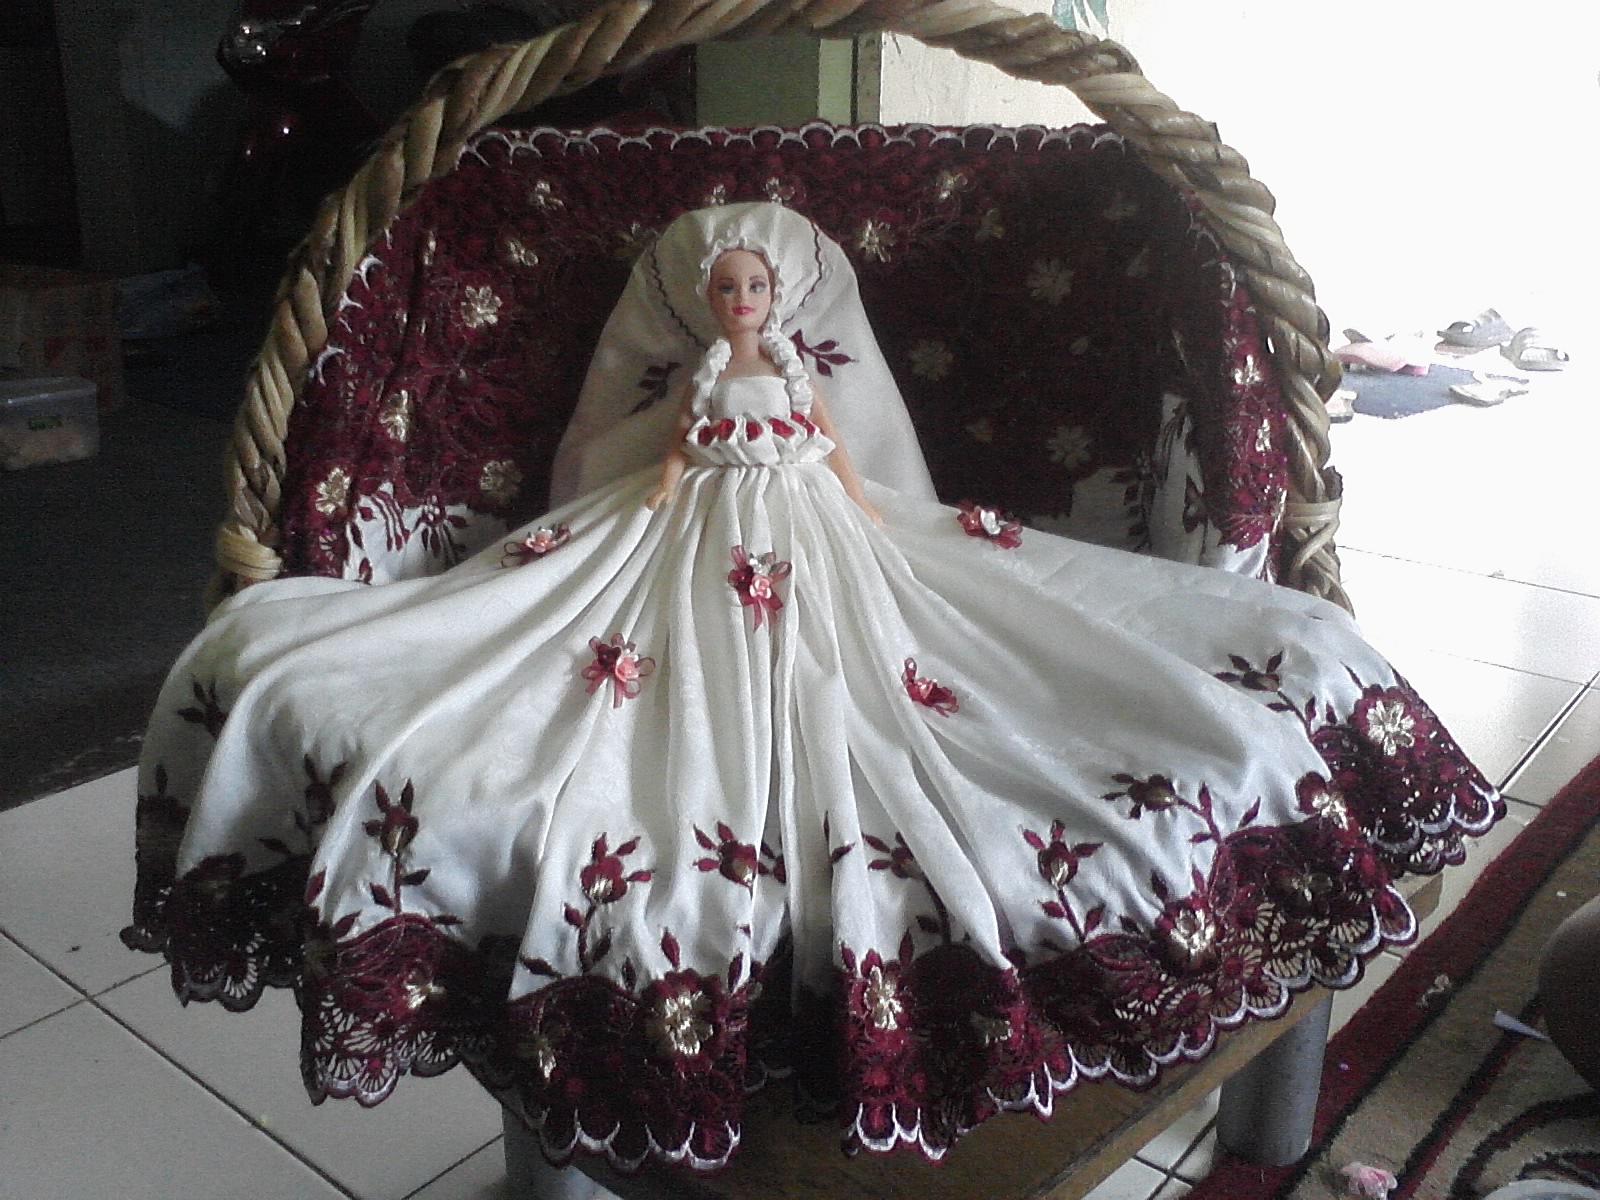 Puji Parcel membuat aneka seserahan untuk Hantaran pernikahan